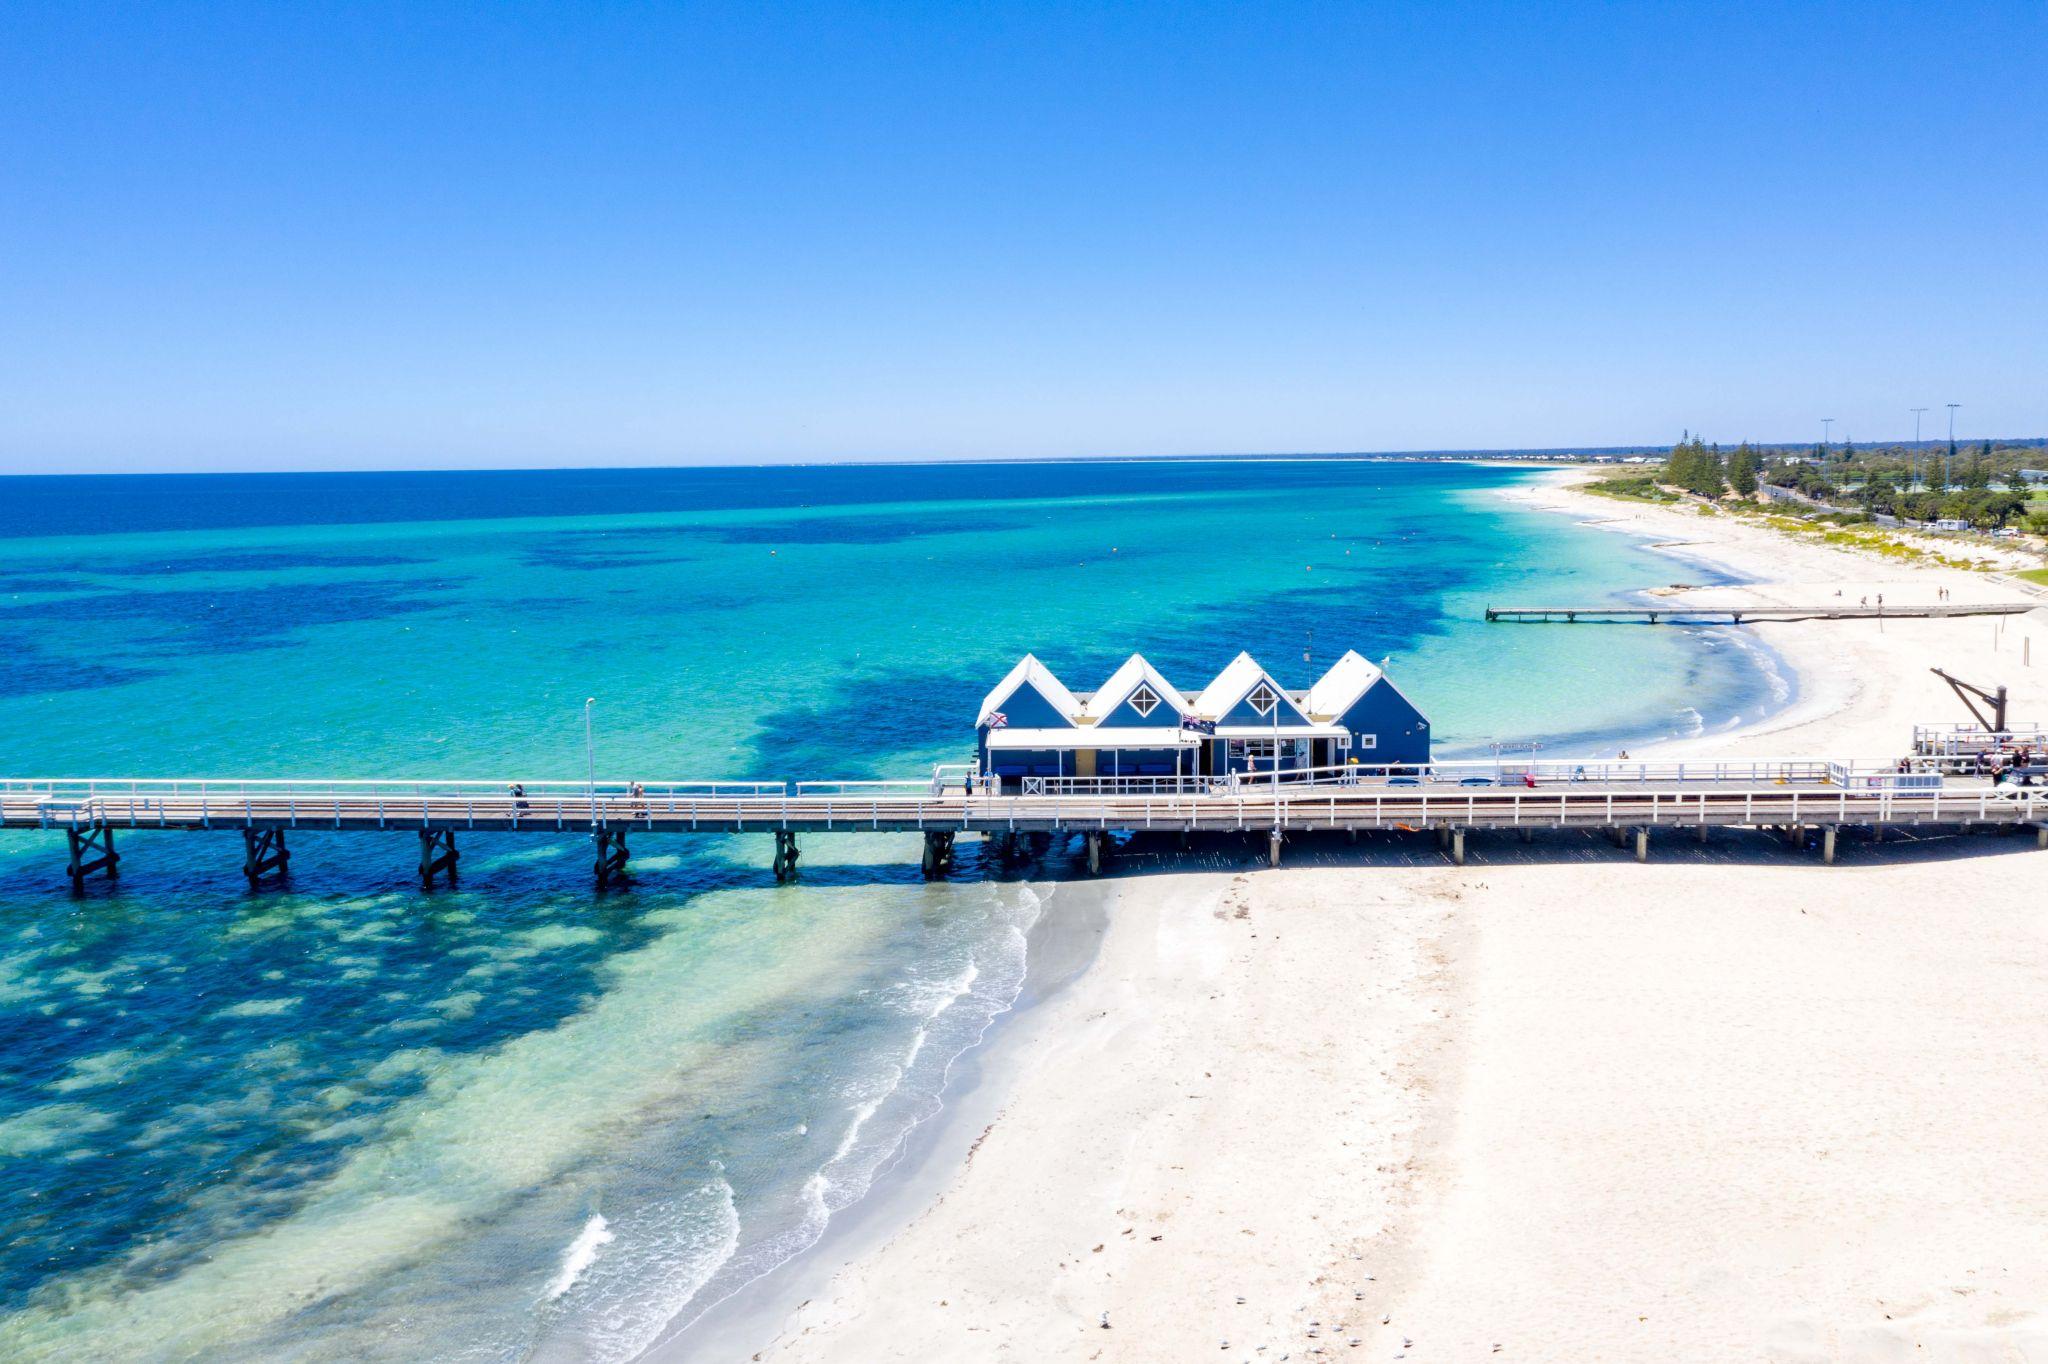 The Pier Sheds, Busselton Western Australia, Australia